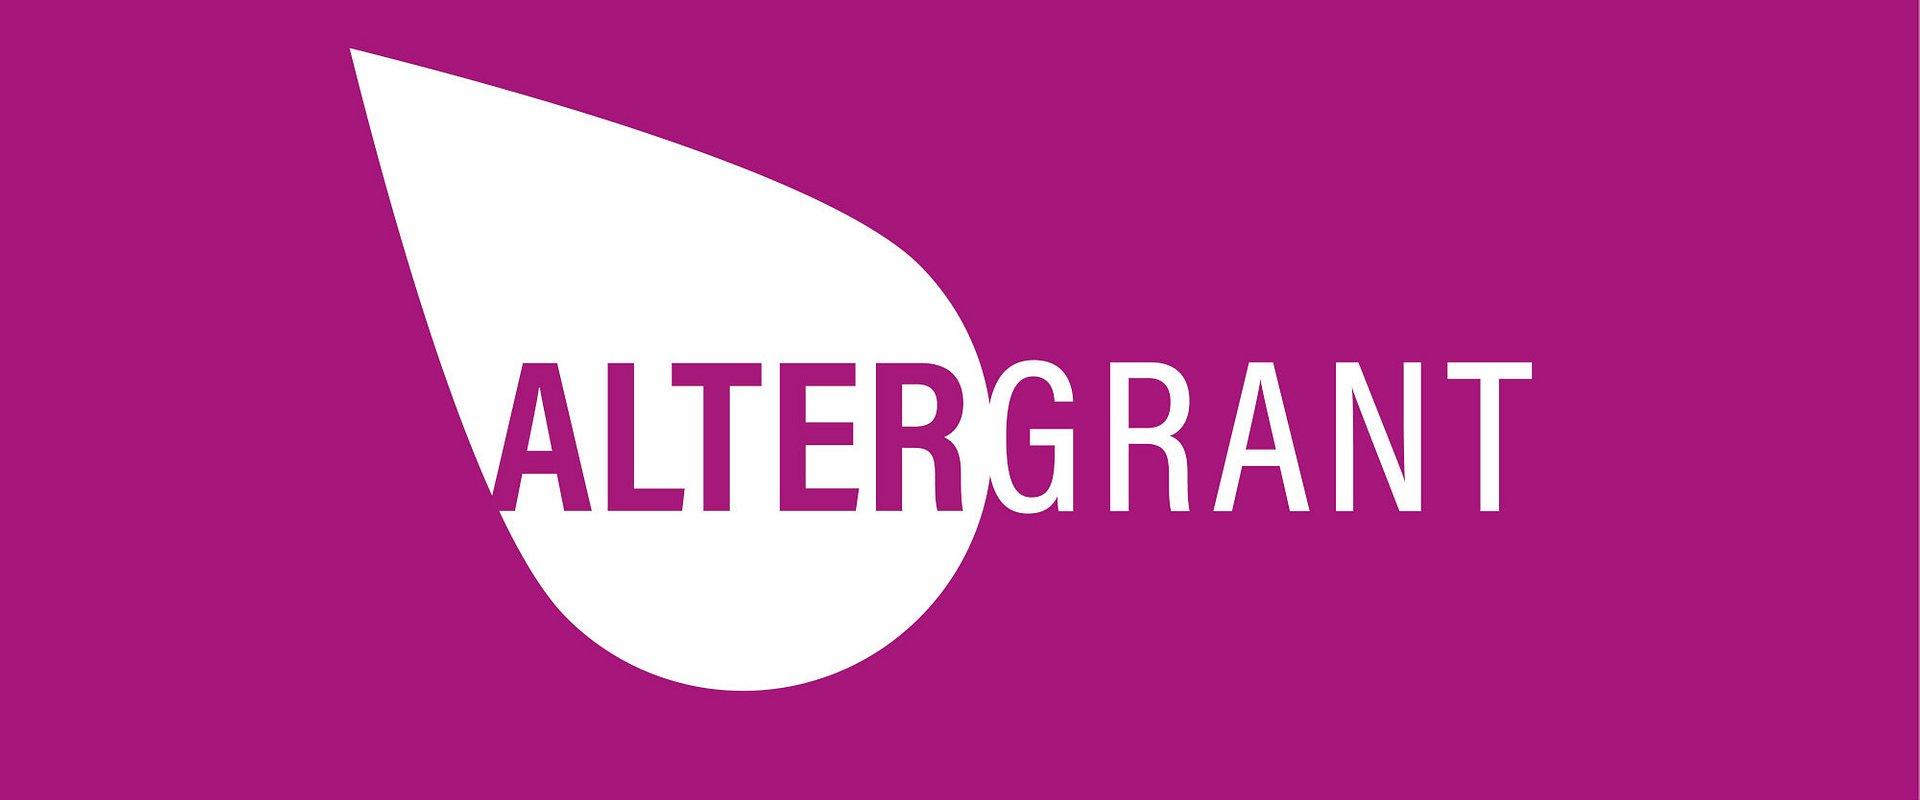 ALTERGRANT 2020 wystartował – zdobądź nagrodę!